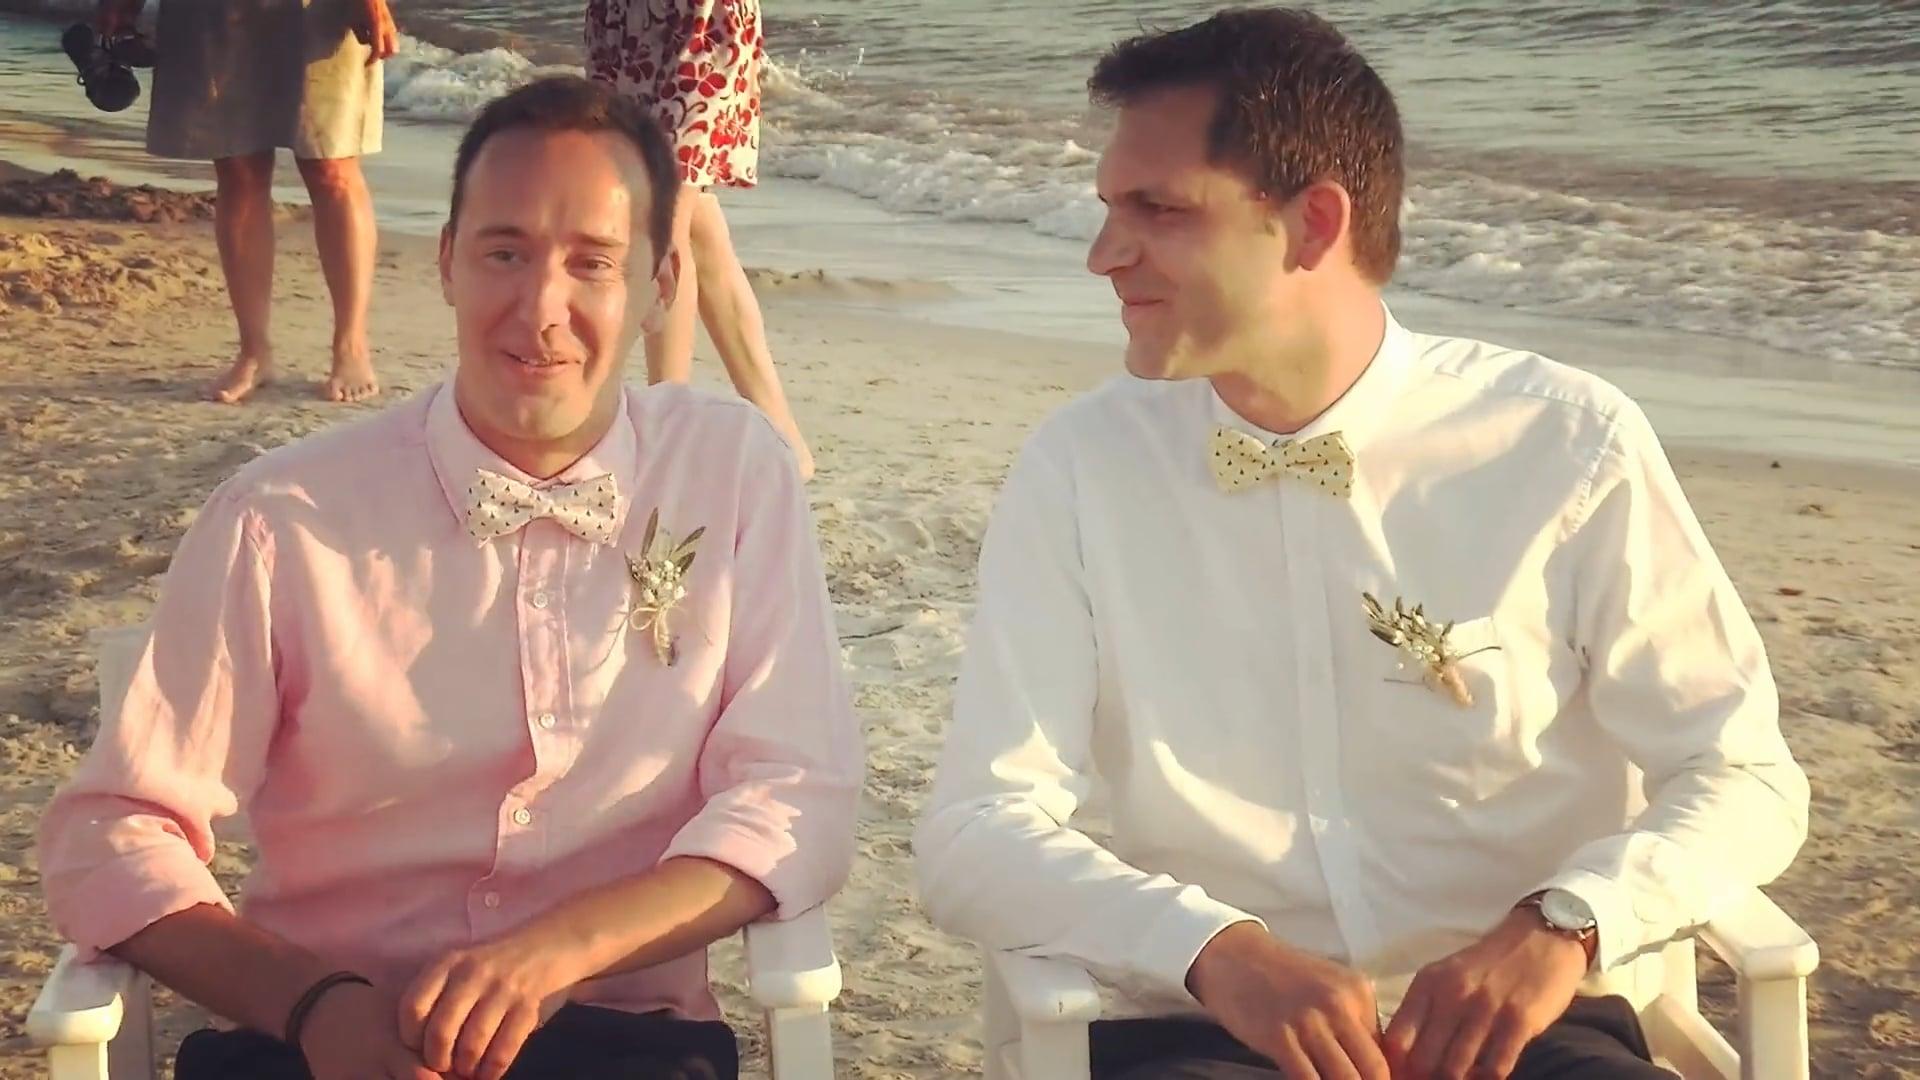 Gay destination wedding (beach party), Mathieu & Nicolas, Naxos island. DJ Nikos Alatas on decks, Video clip, Epic!